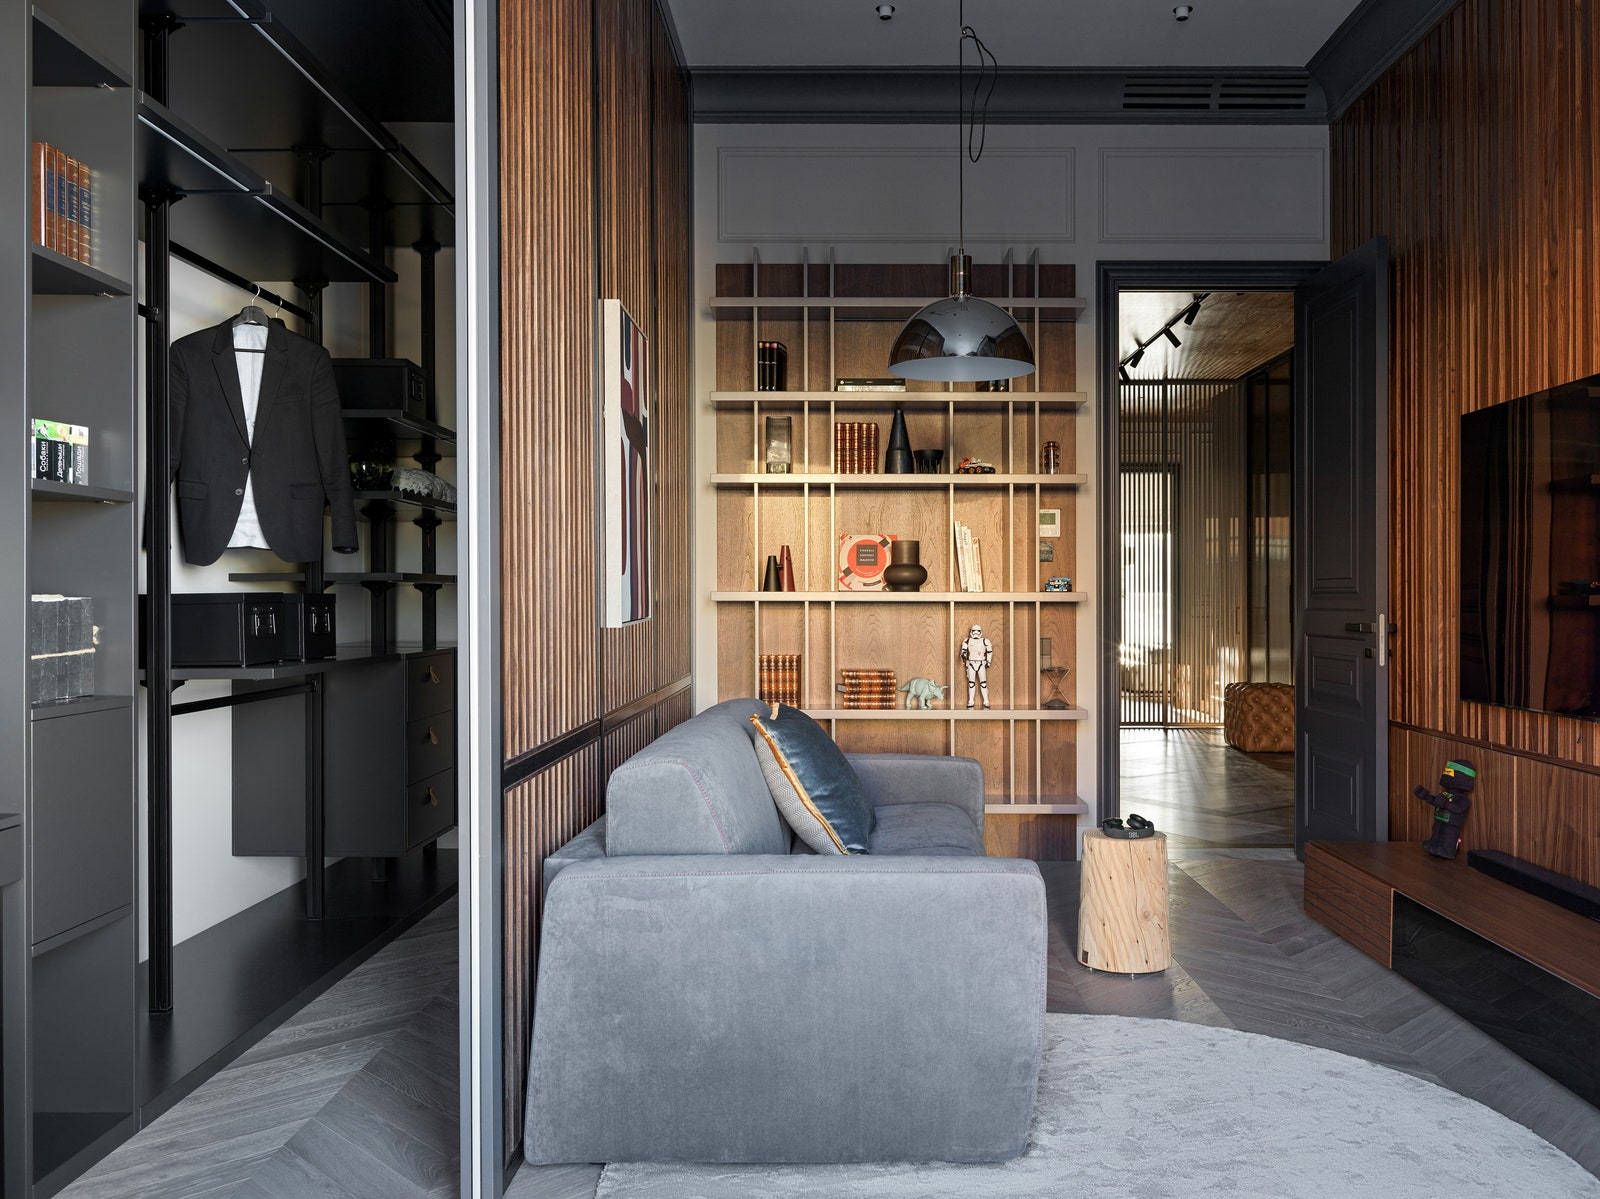 Tyson Felis    BoConcept   Legno Vivo           Nemo  Scanddyy  Barcelona Design  Enere  Moonstores  Barcelona Design.